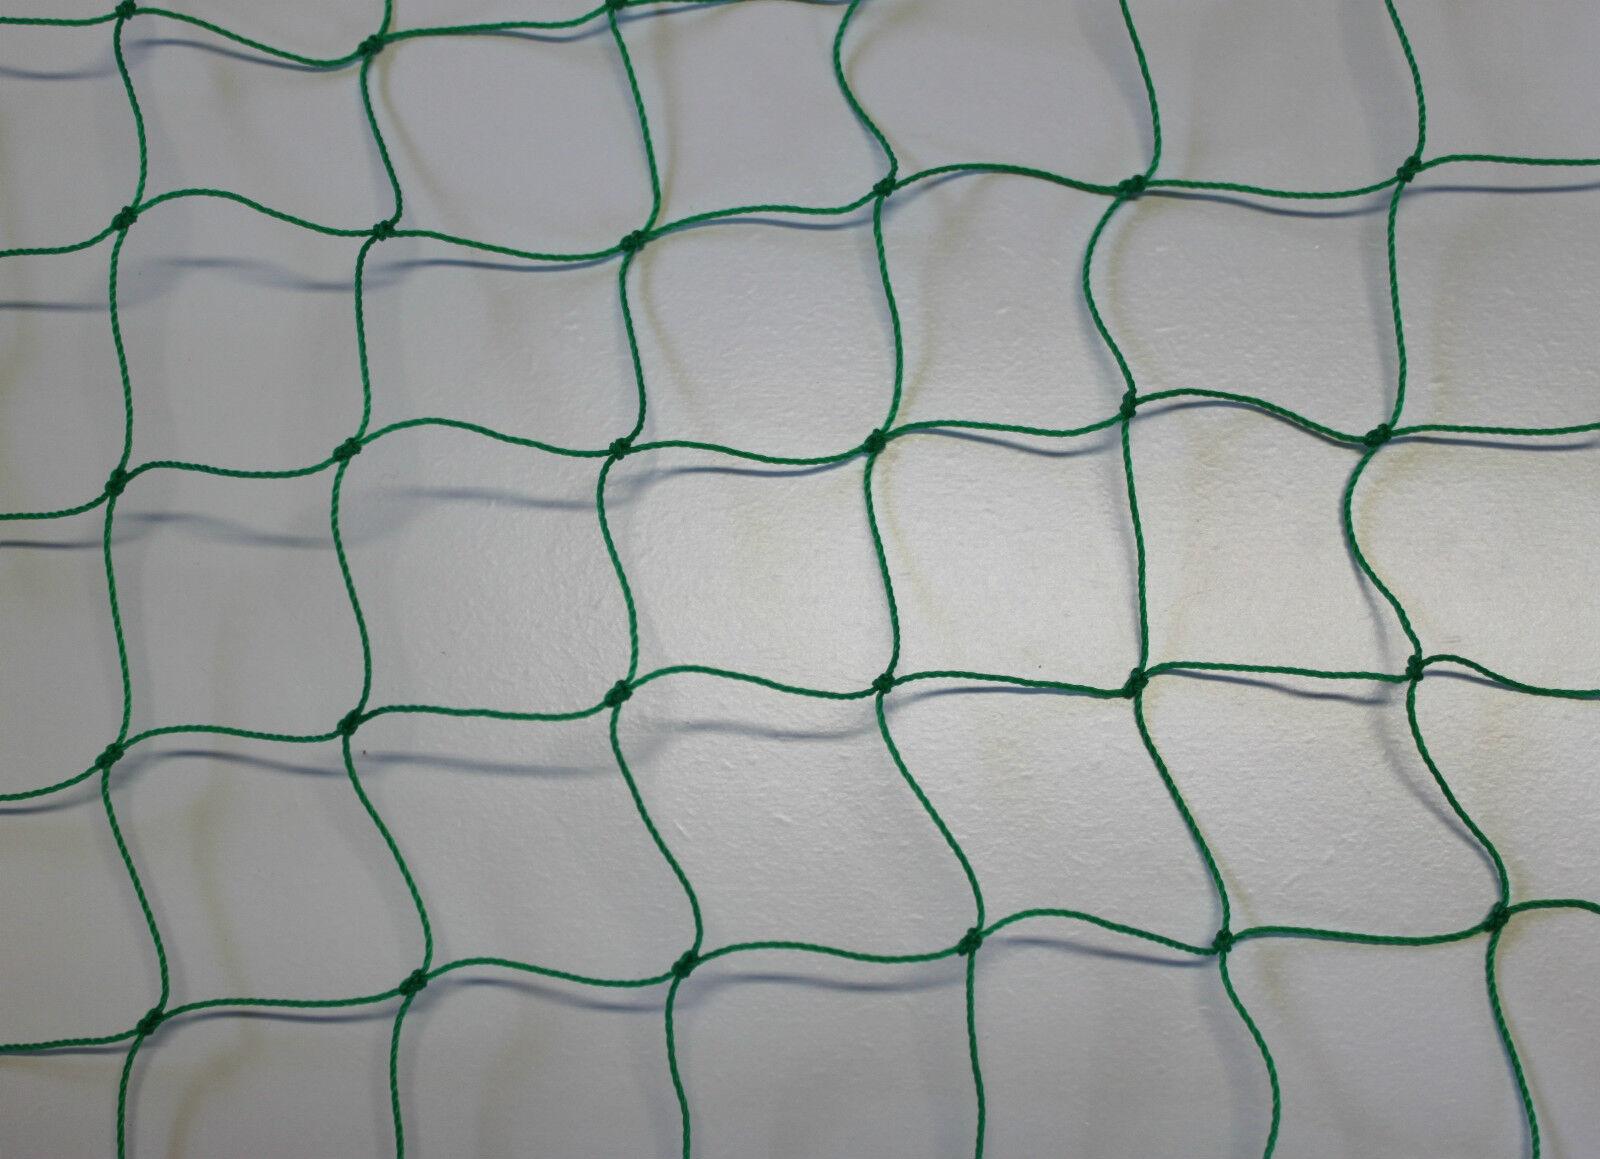 Ballnetz Meterware Höhe 5,00 m x 20,00 m grün grün grün Ballfangnetz Fußballnetz Netz 4d69b1